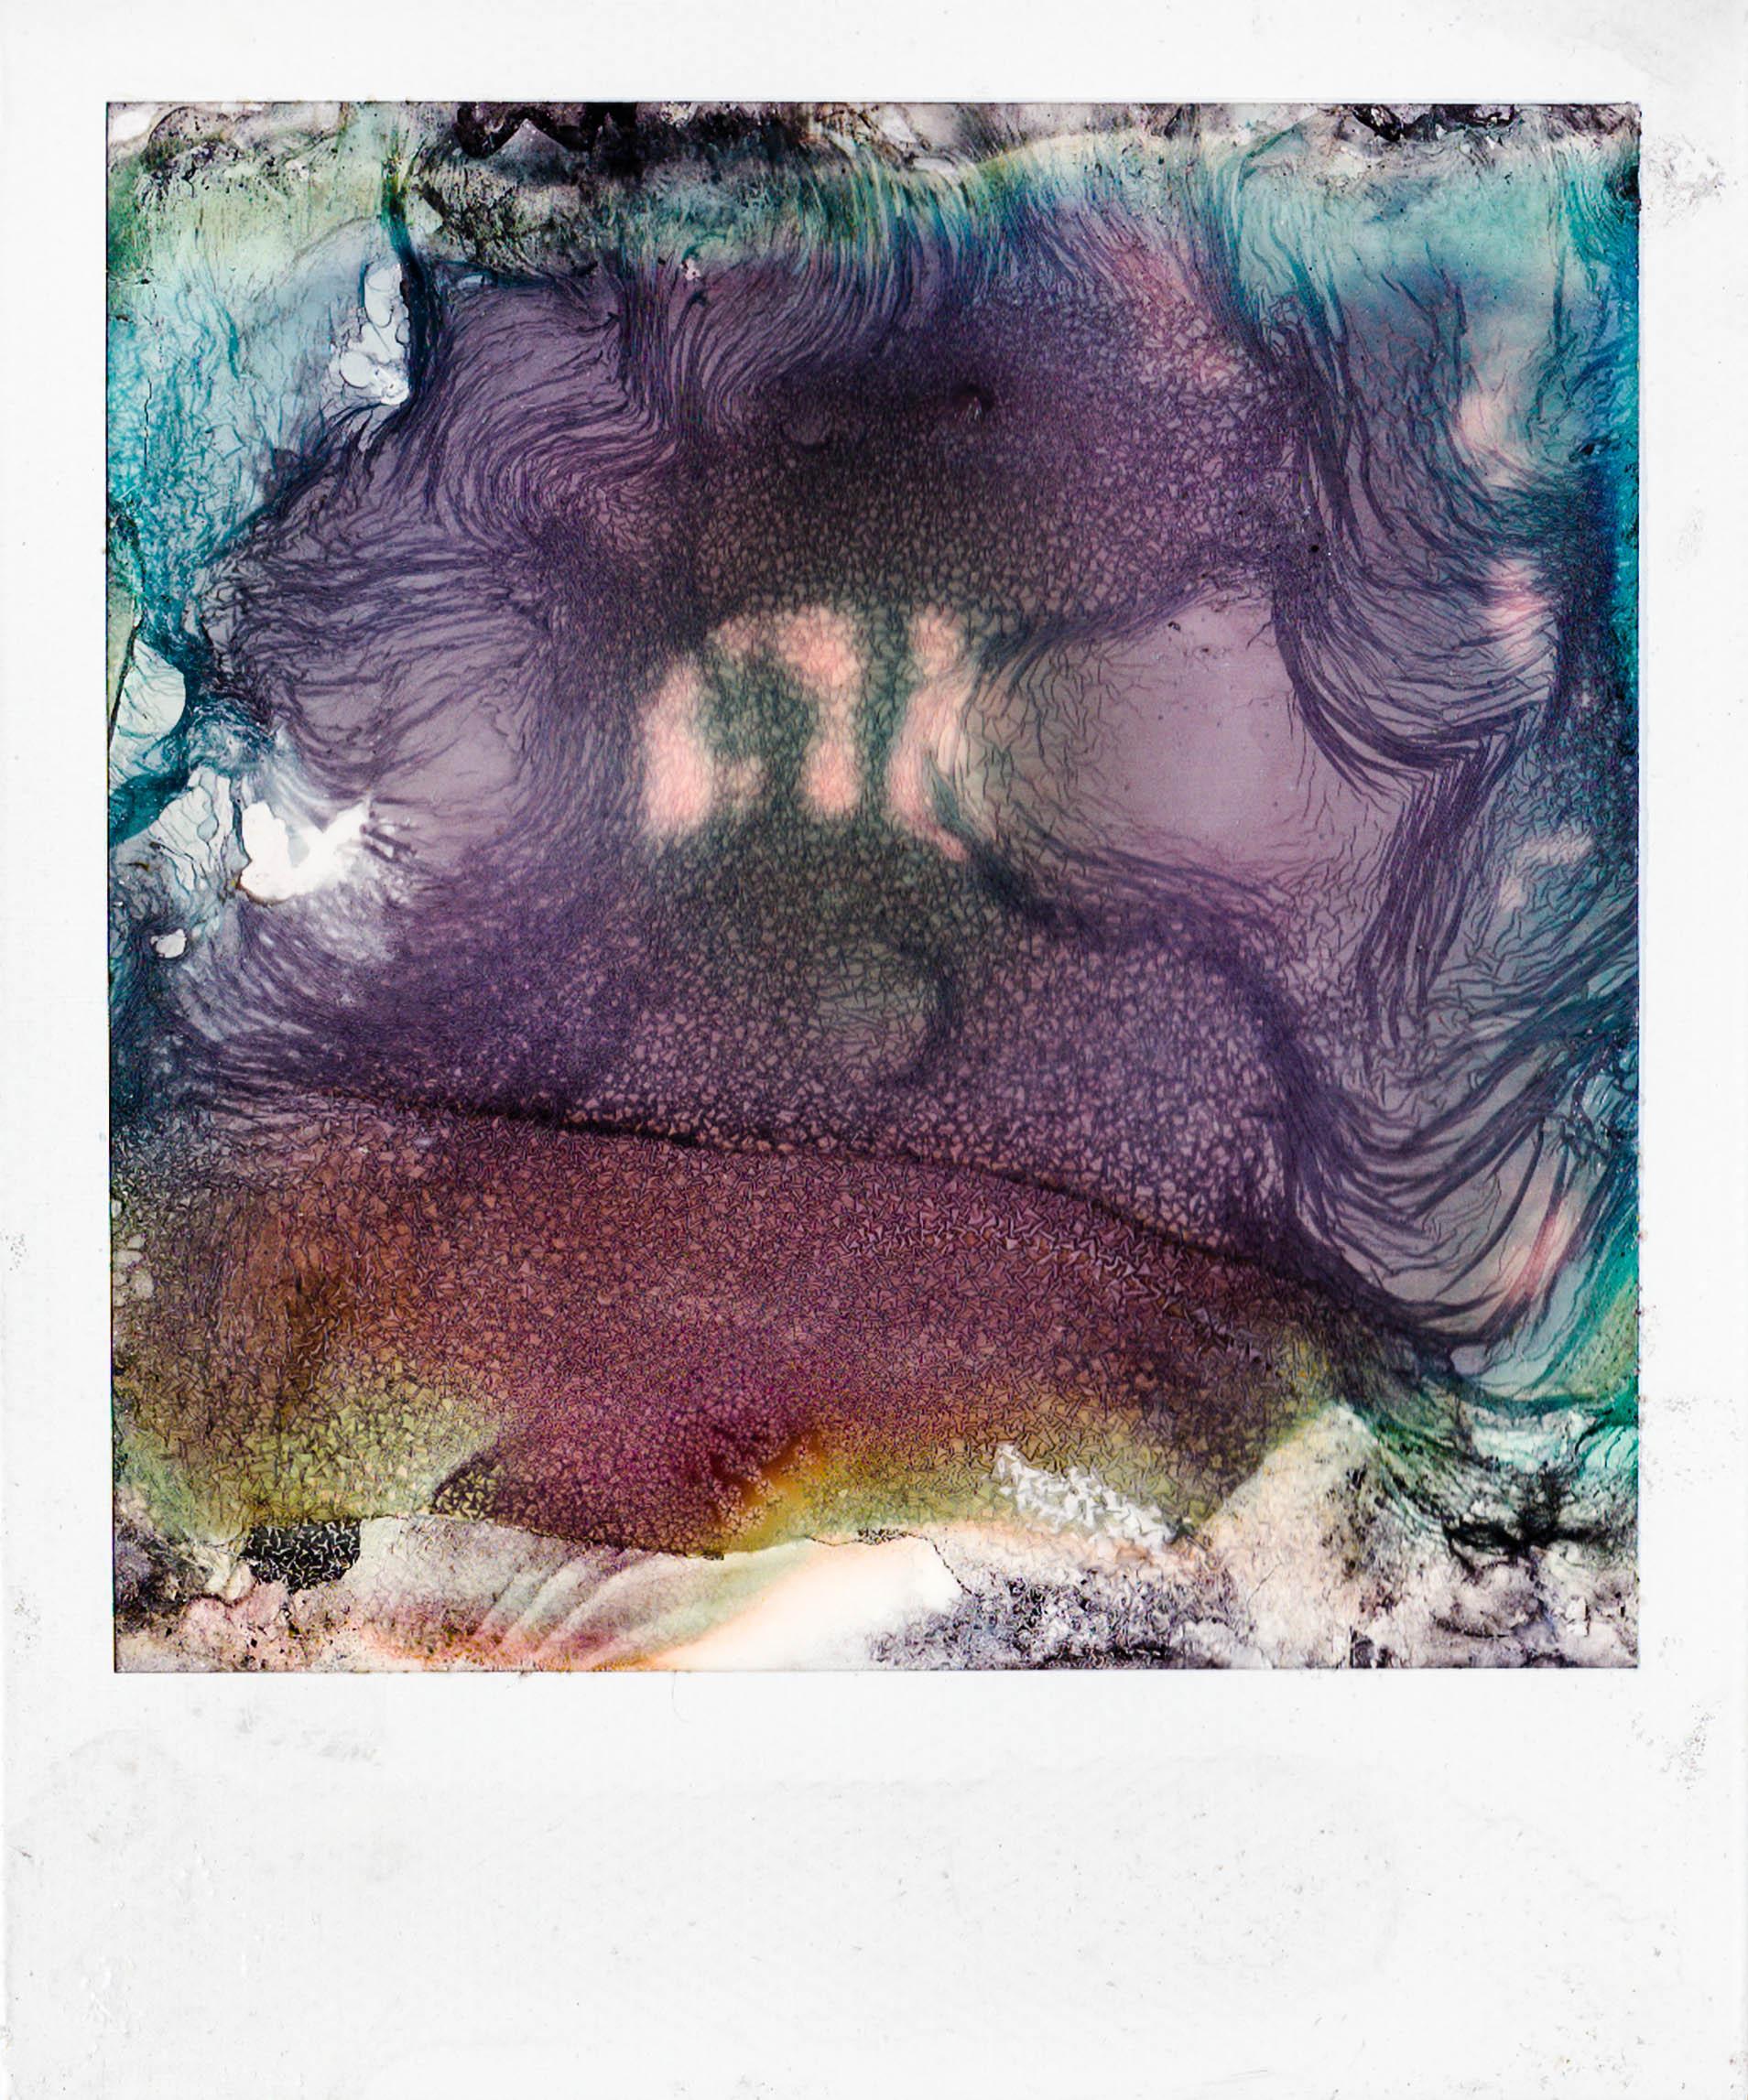 polaroid5 copy.jpg